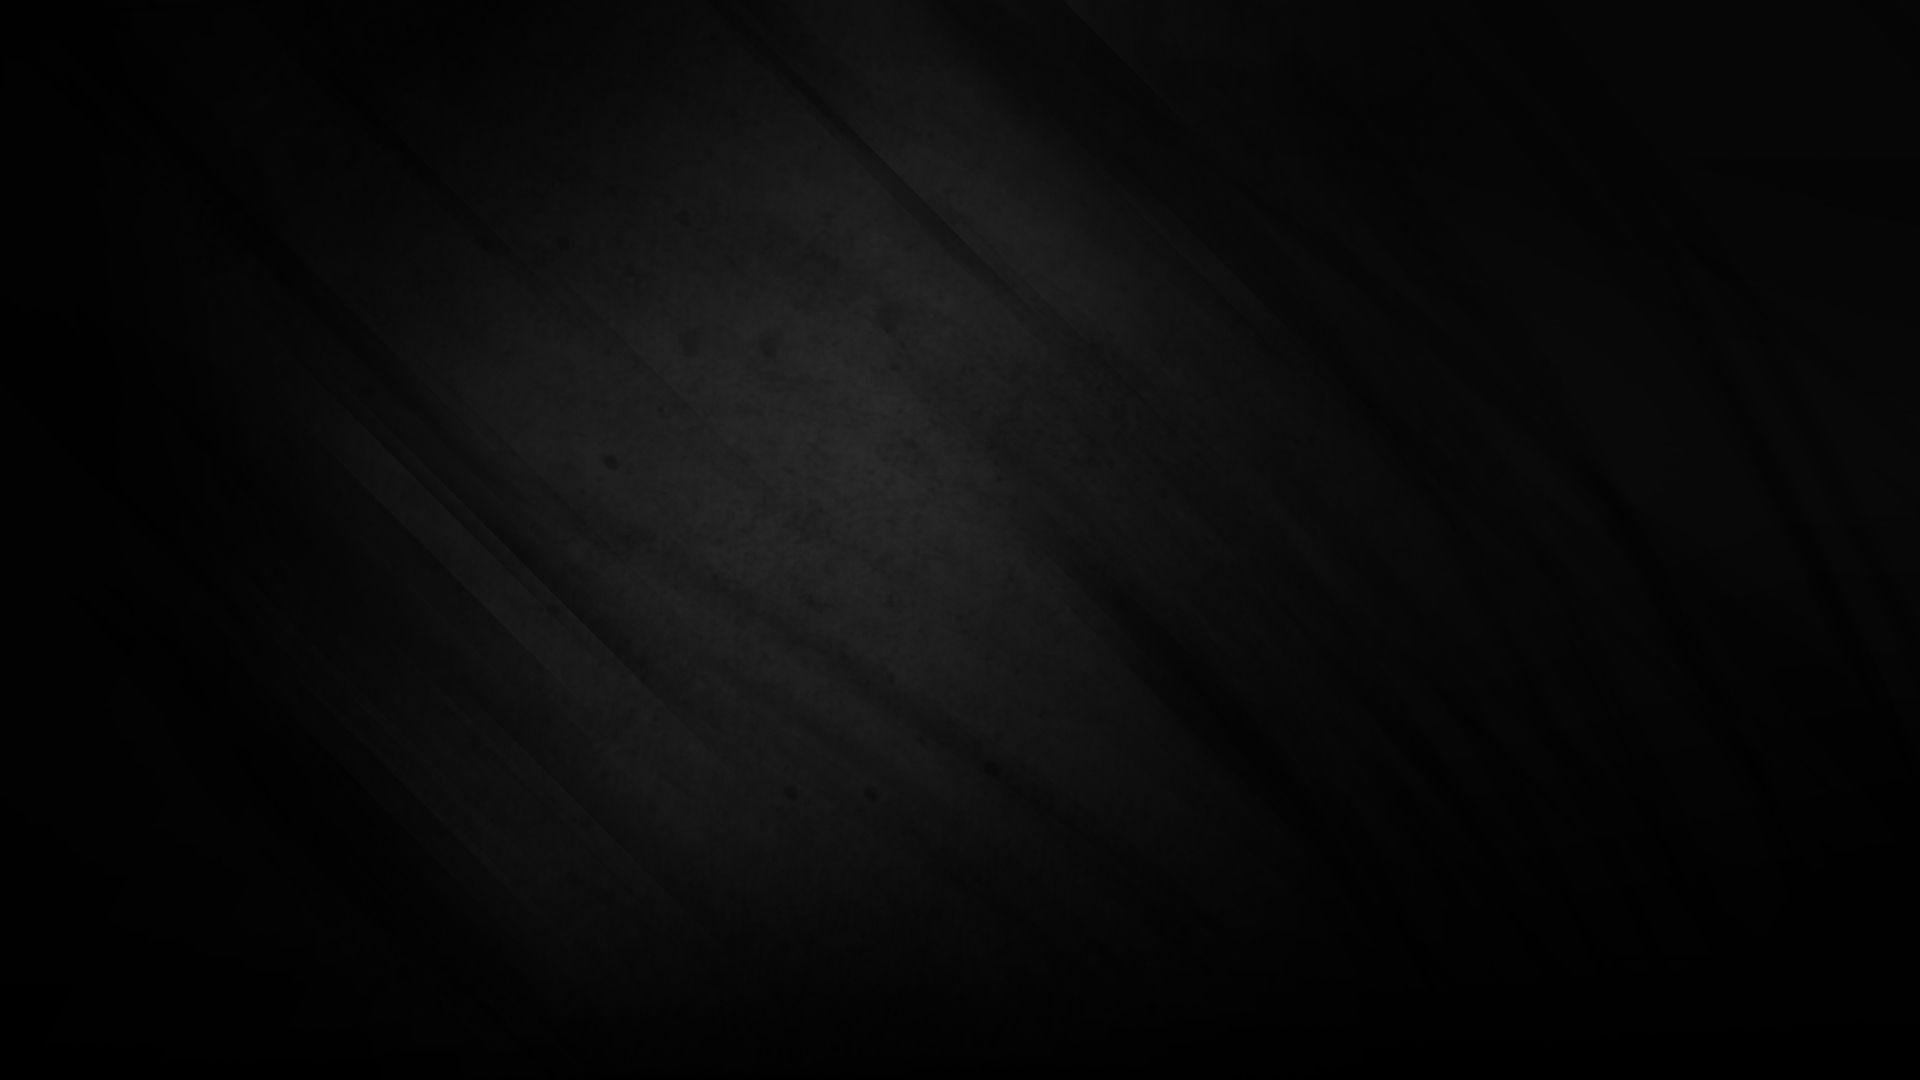 Solid Black Wallpapers 1920x1080 Wallpaper Cave